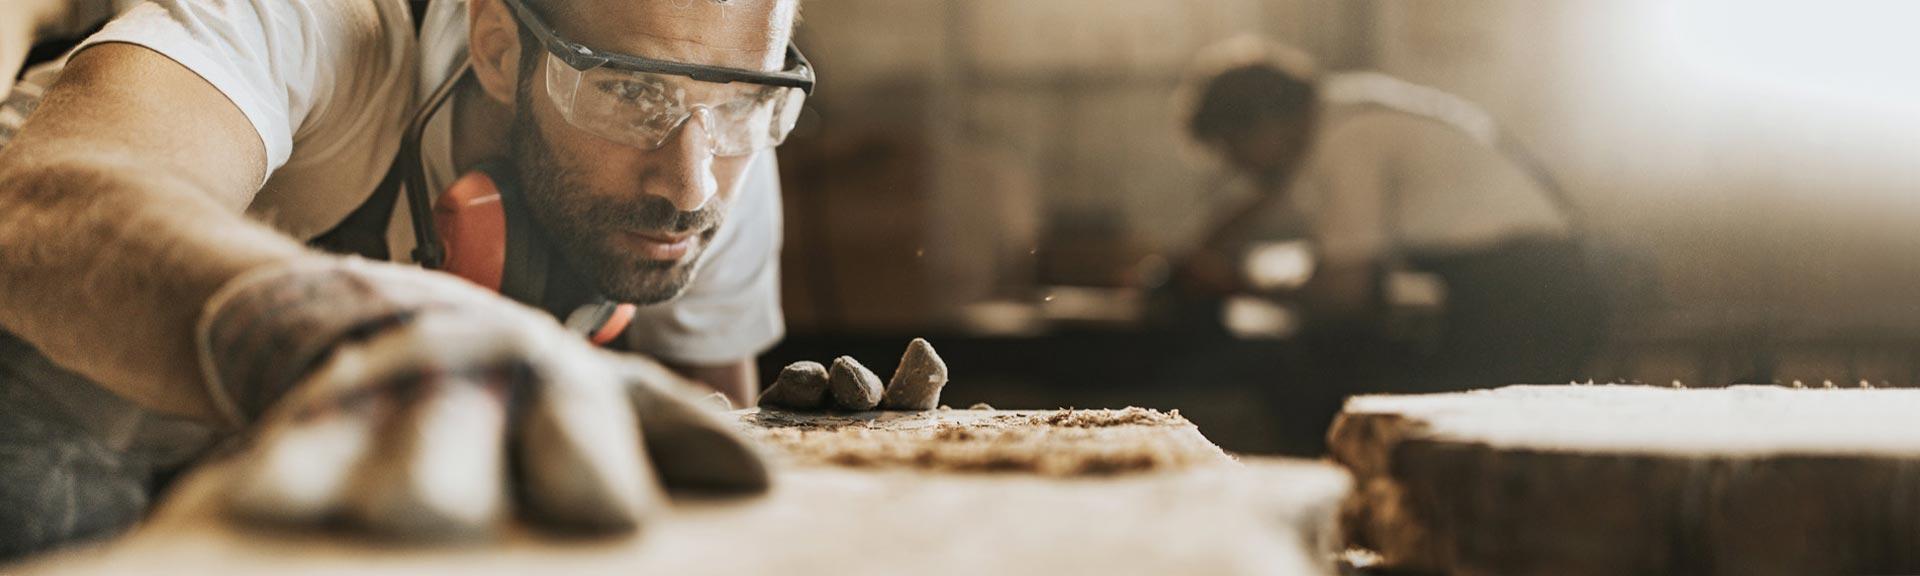 Luftbefeuchtung Holzindustrie